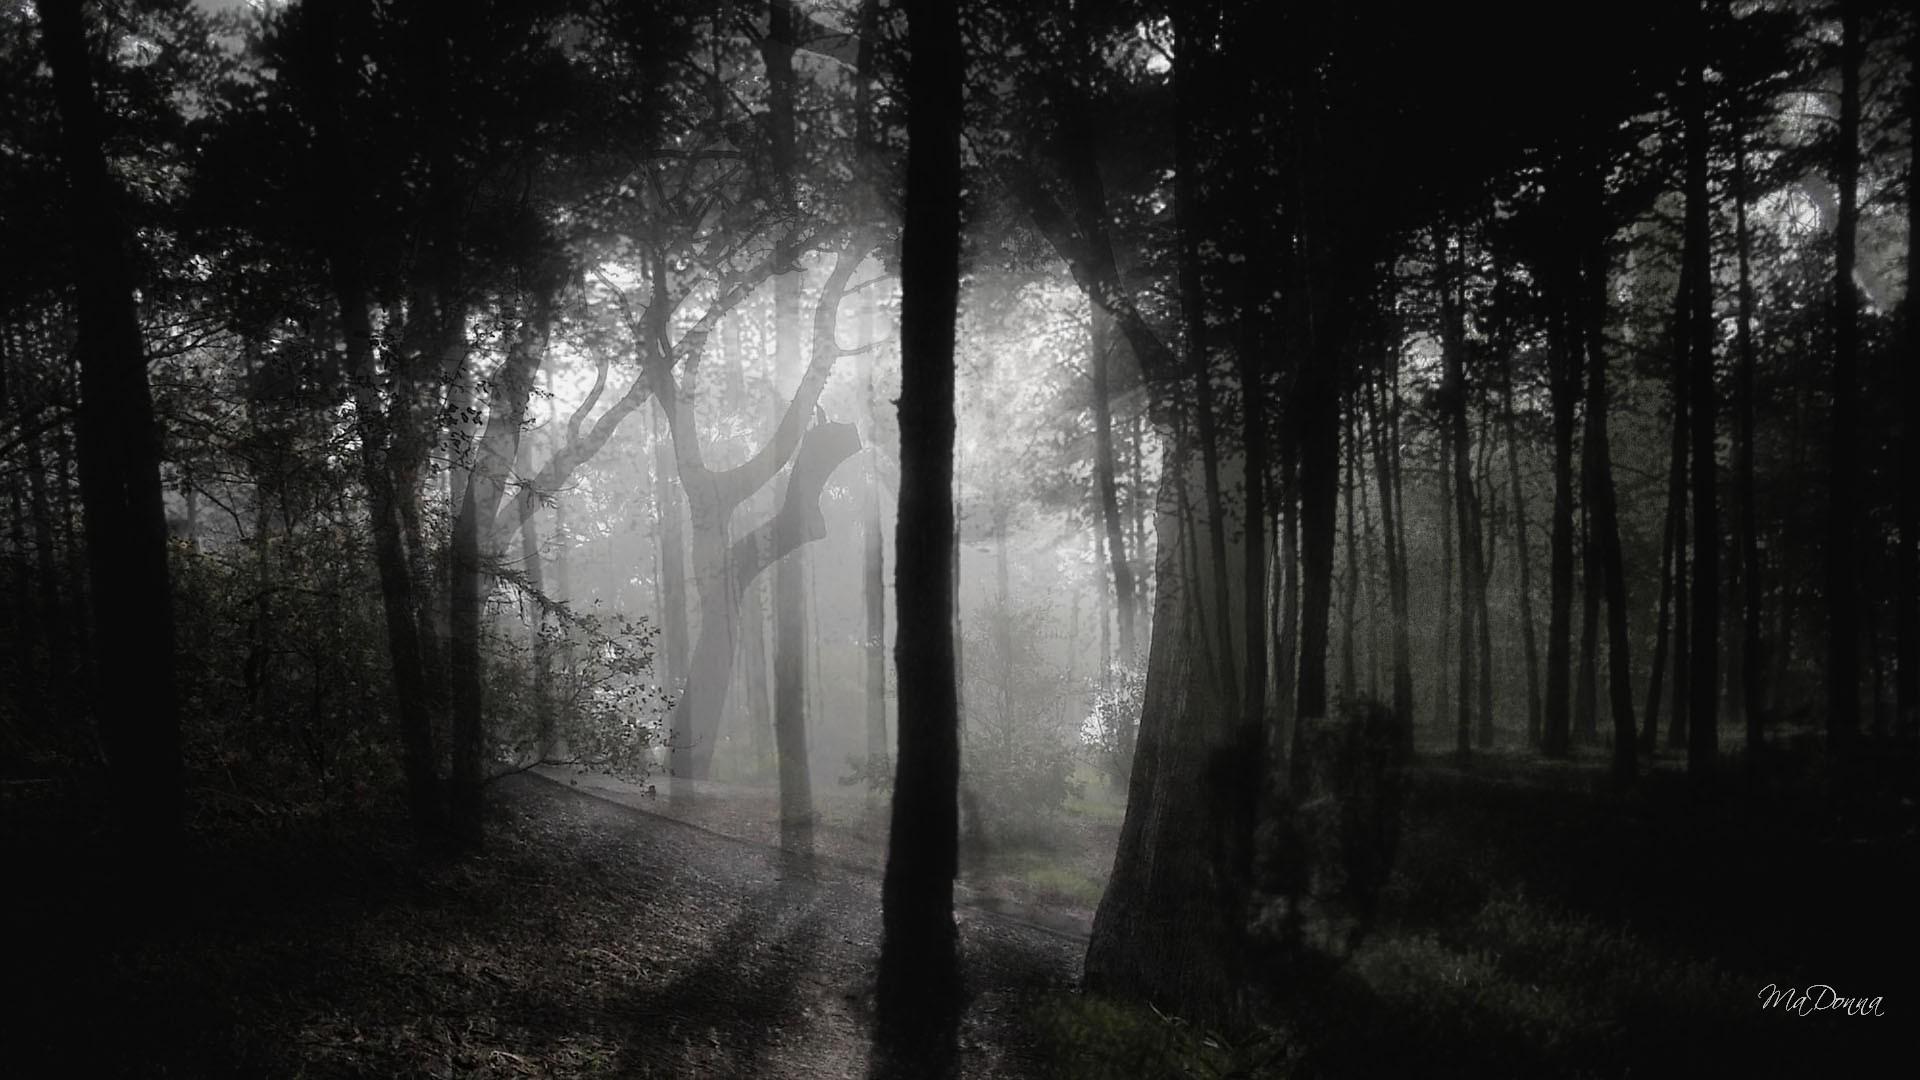 Fall Wallpaper With Deer Download Dark Woods Wallpapers Hd Free Pixelstalk Net